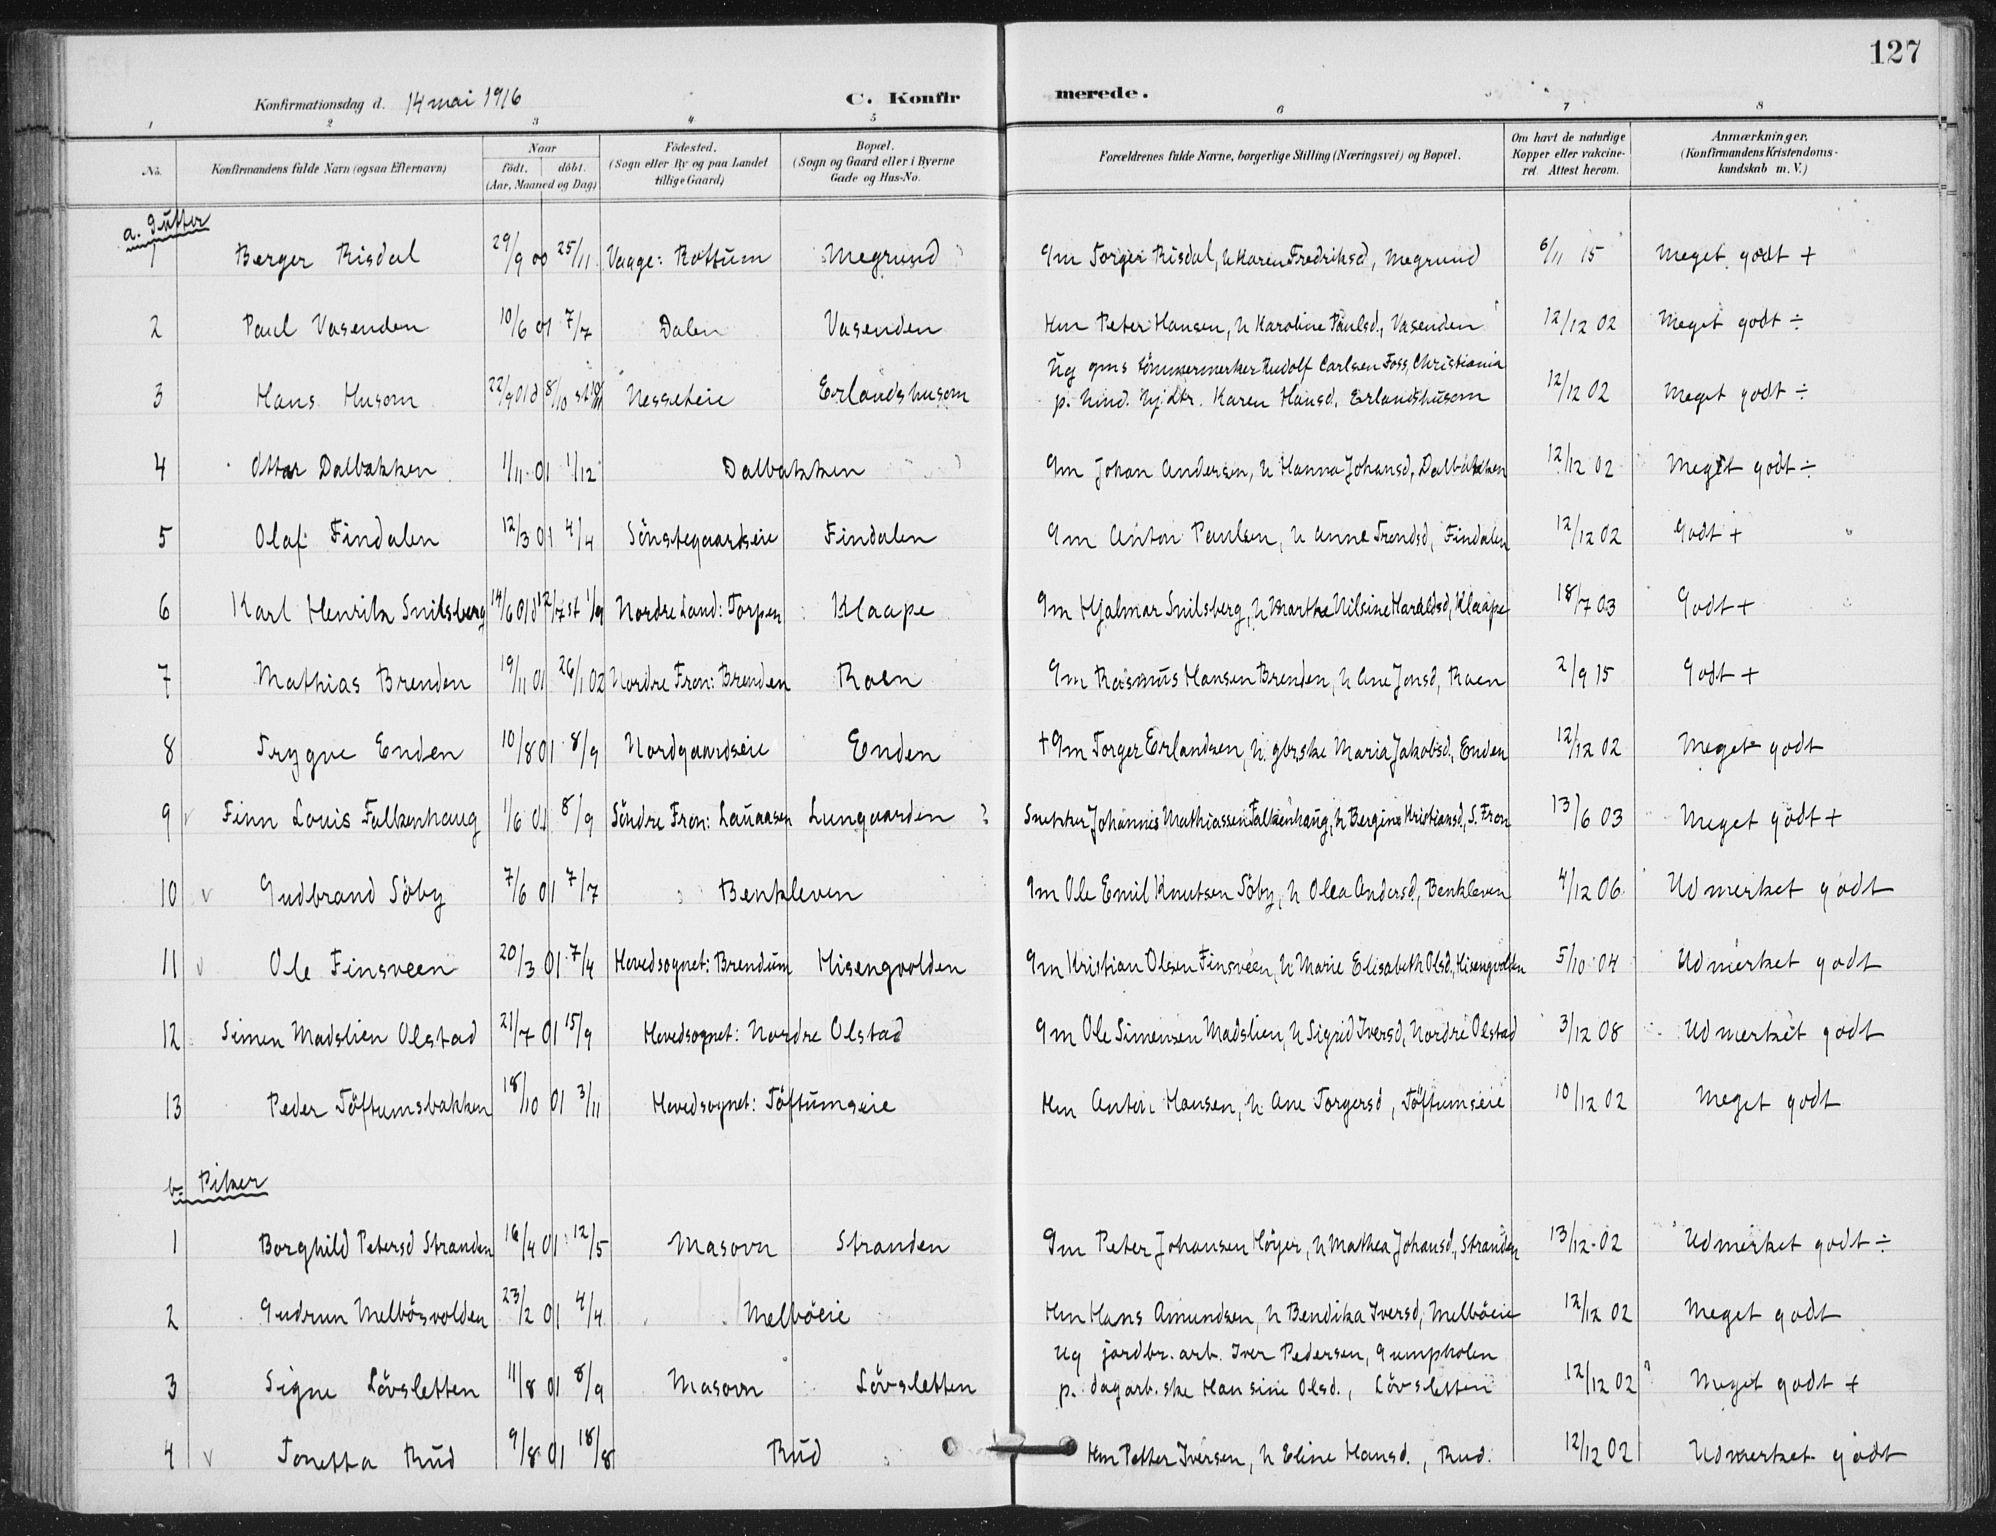 SAH, Vestre Gausdal prestekontor, Klokkerbok nr. 4, 1898-1939, s. 127